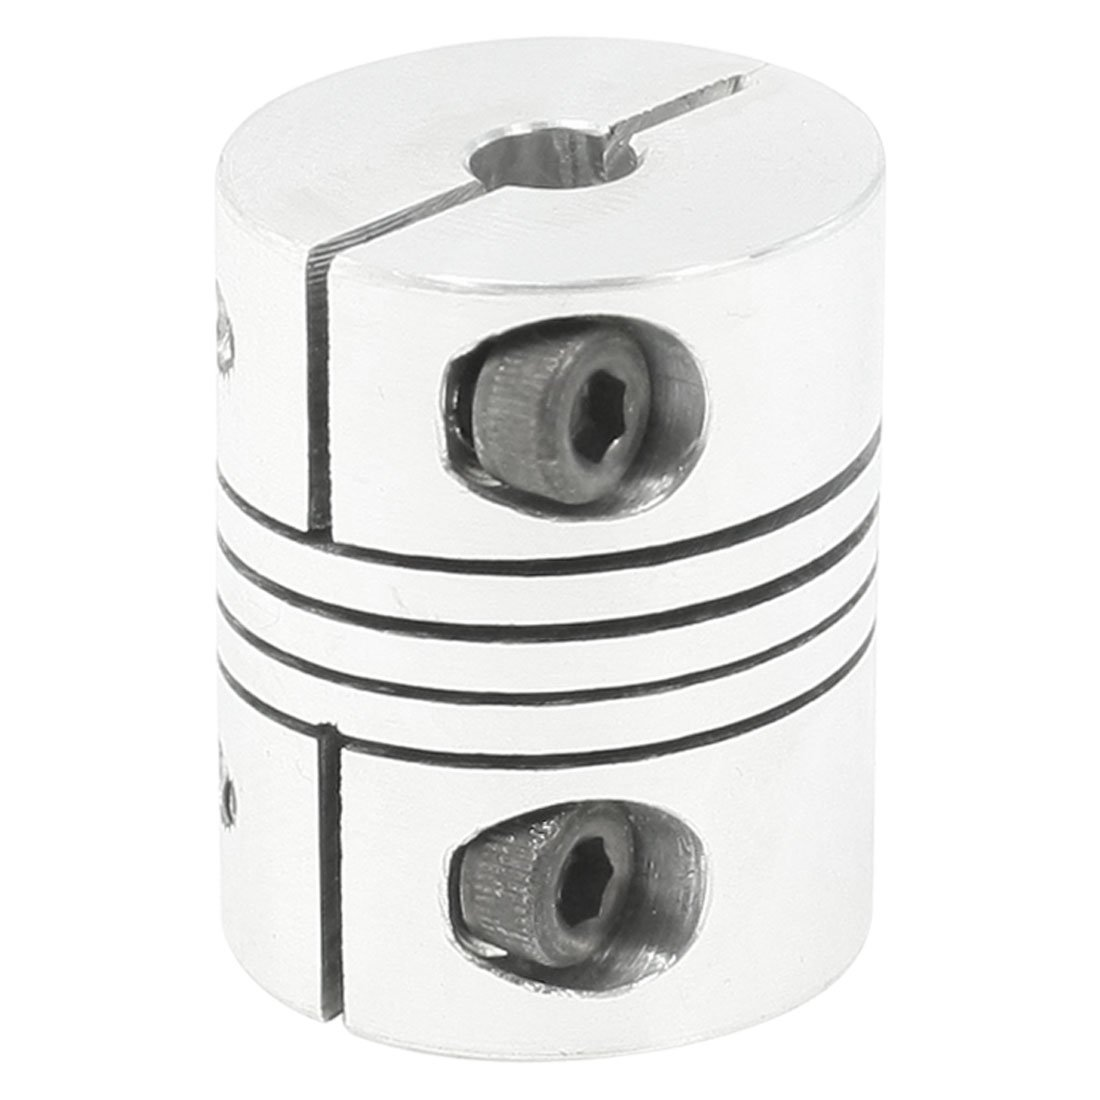 Fevas 1pcs 8X8 D25L30 Aluminium Shaft Plum Blossom Coupling Motor Connector Flexible Shaft Coupling